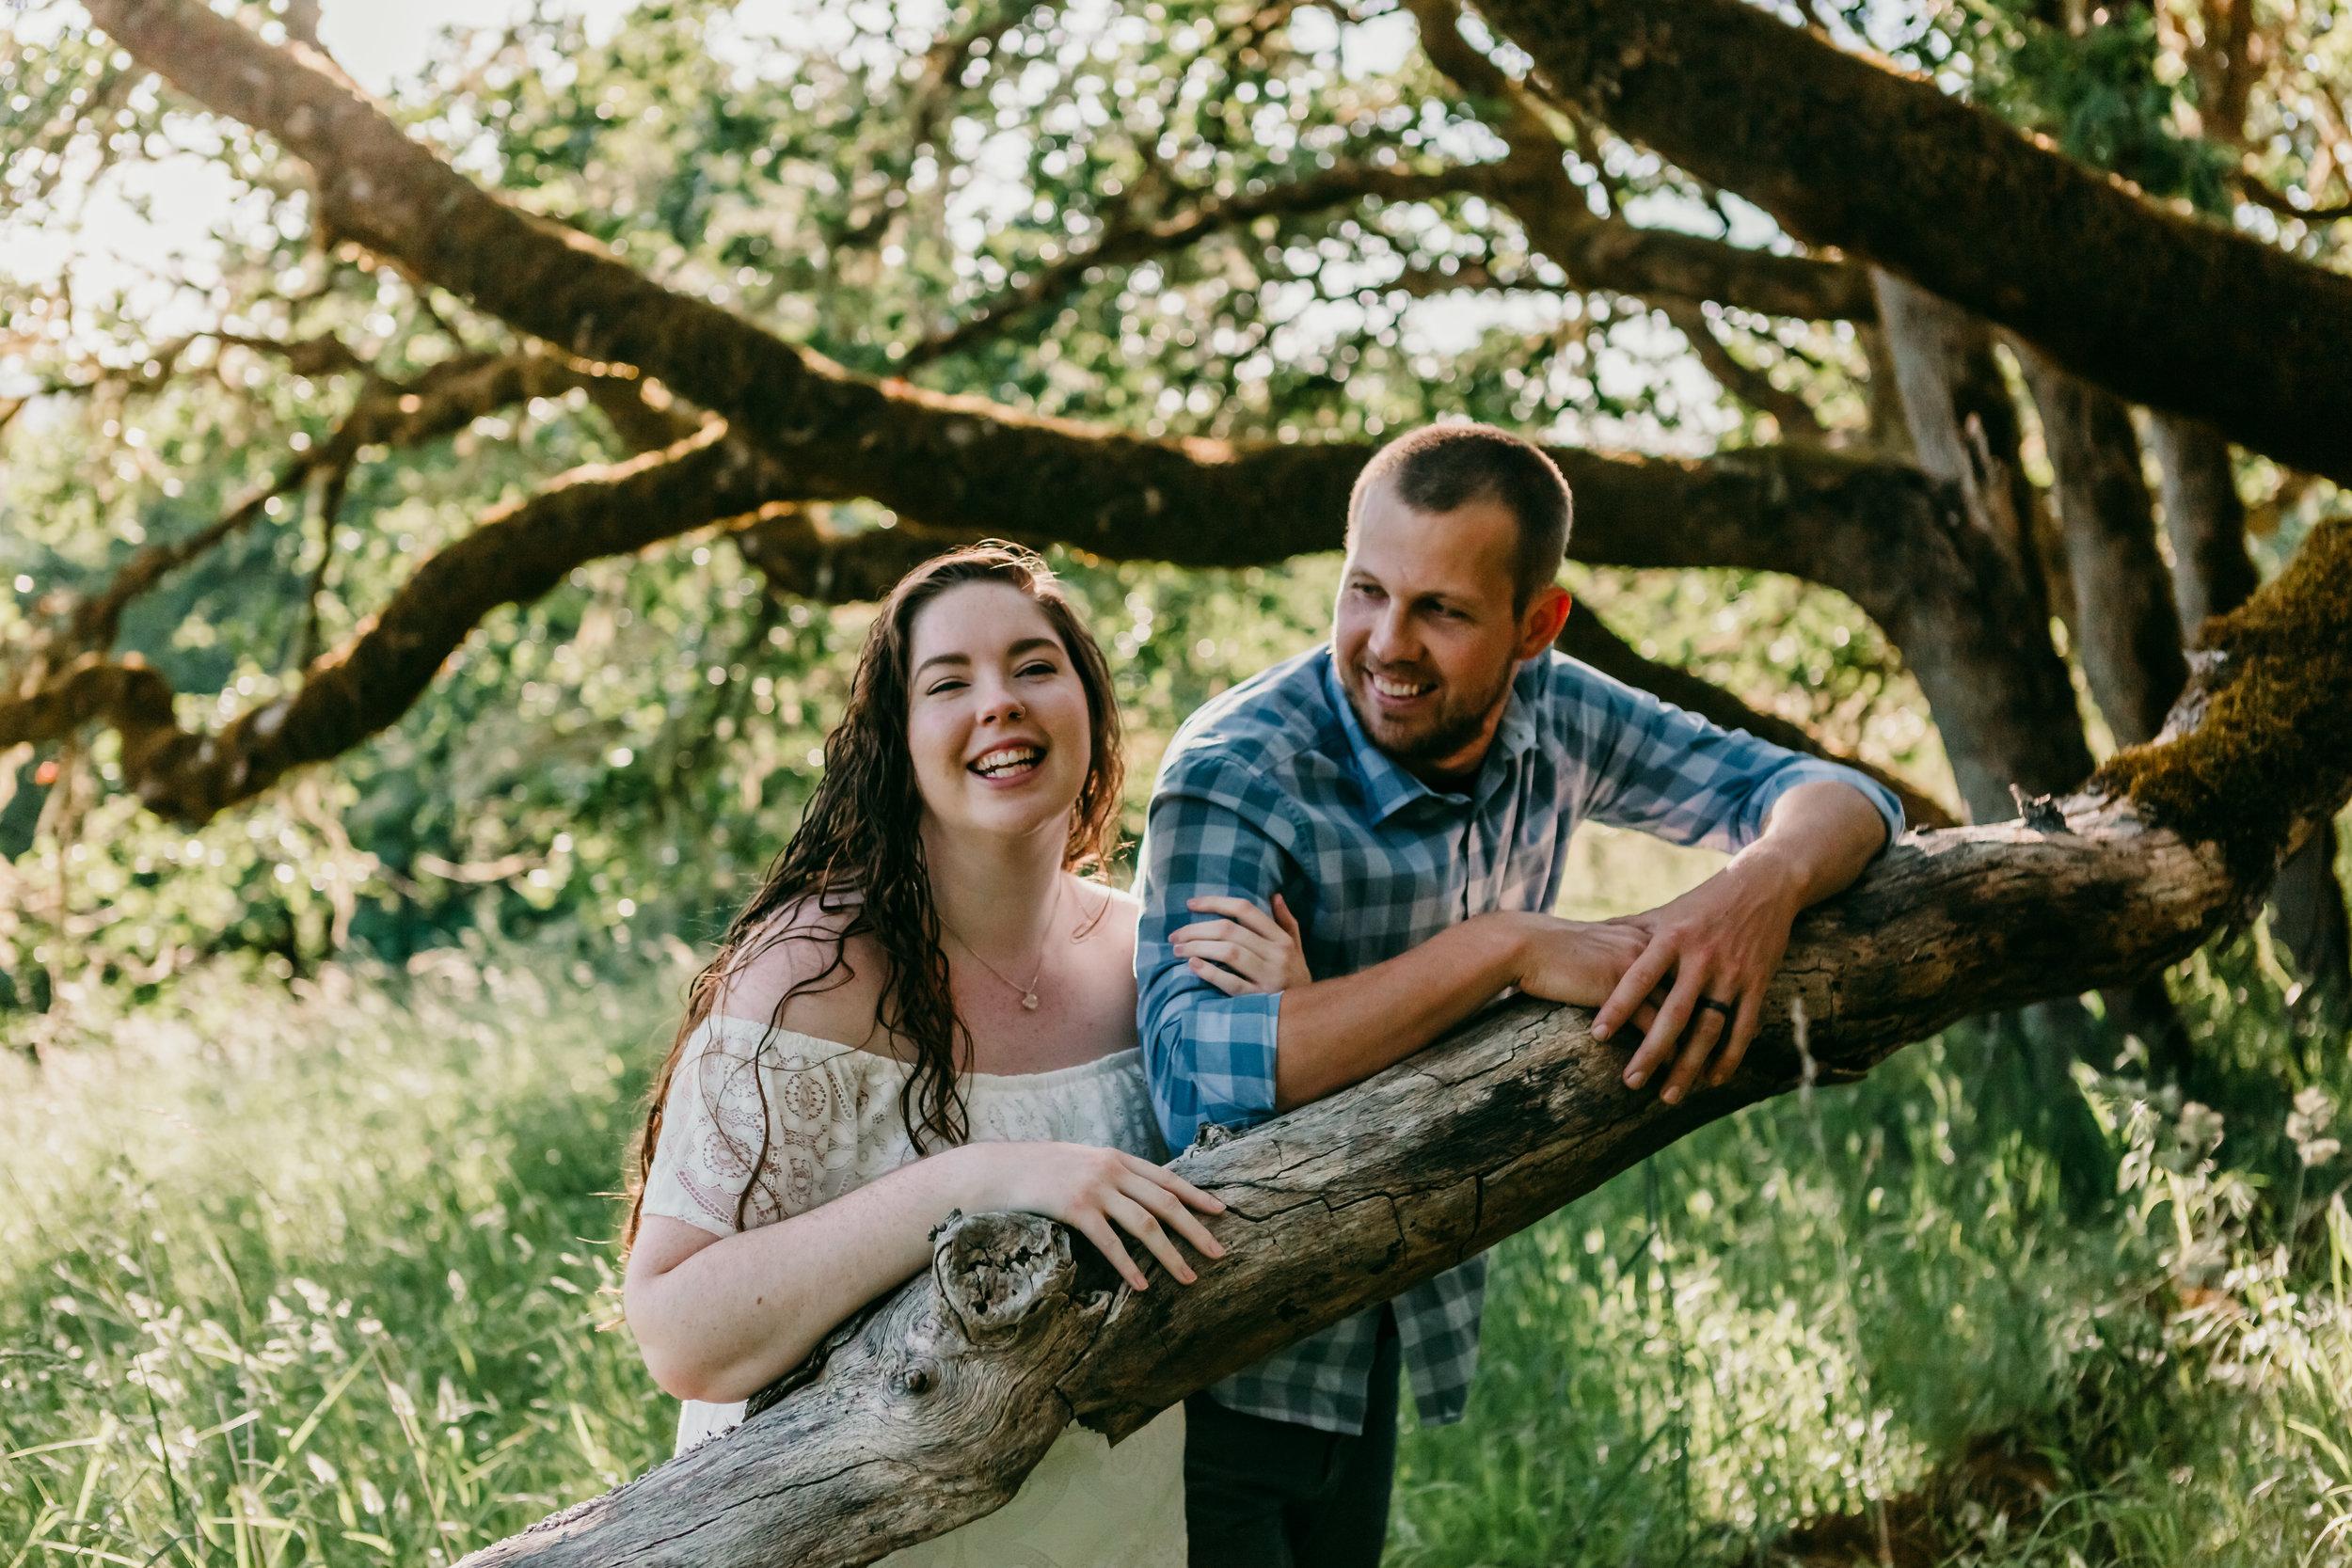 corvallis-oregon-photographer-fitton-green-engagement-photos4.jpg